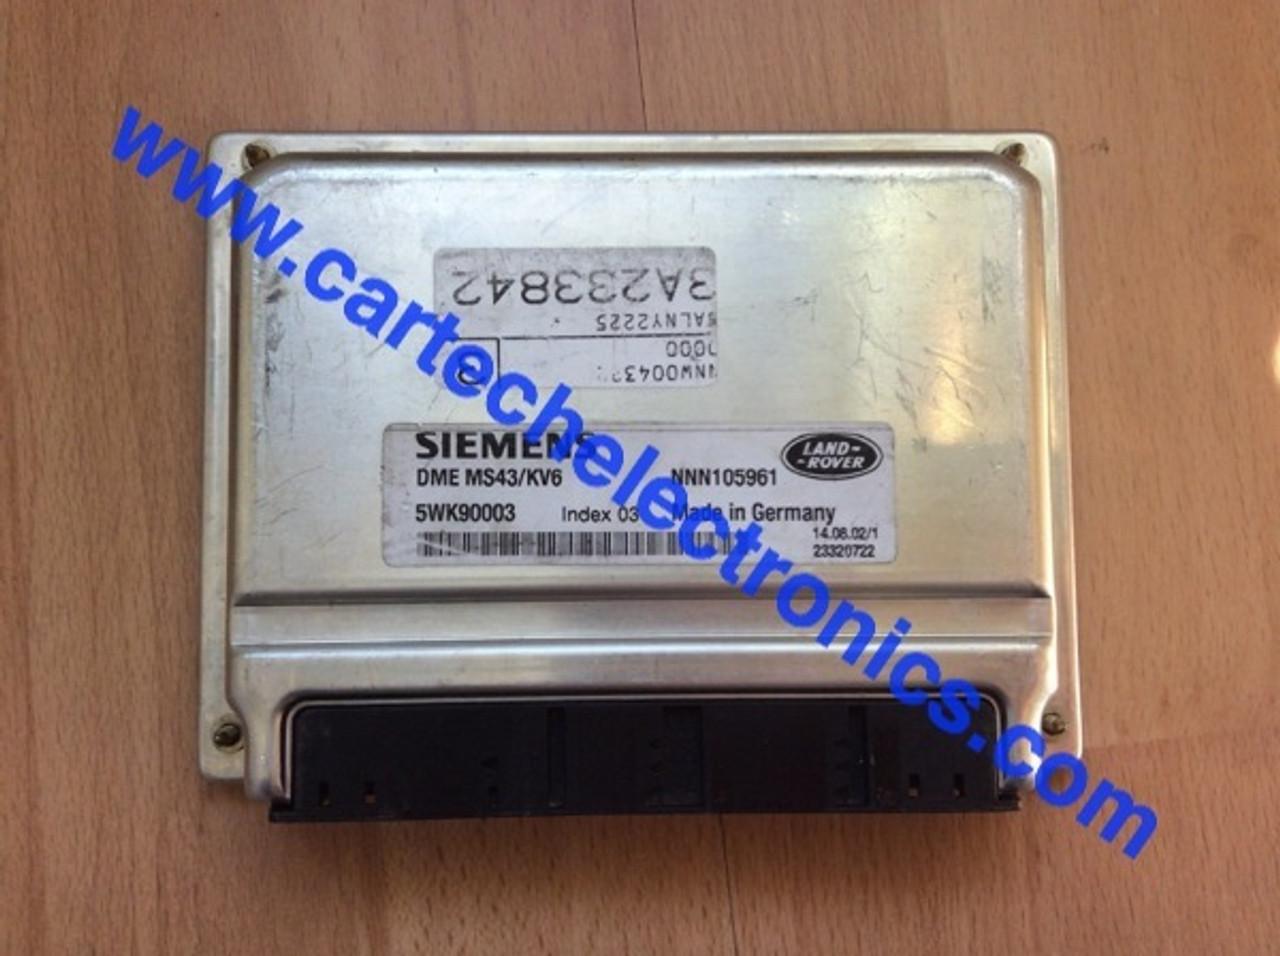 Plug & Play Siemens Engine ECU, Land Rover Freelander, DME MS43/KV6